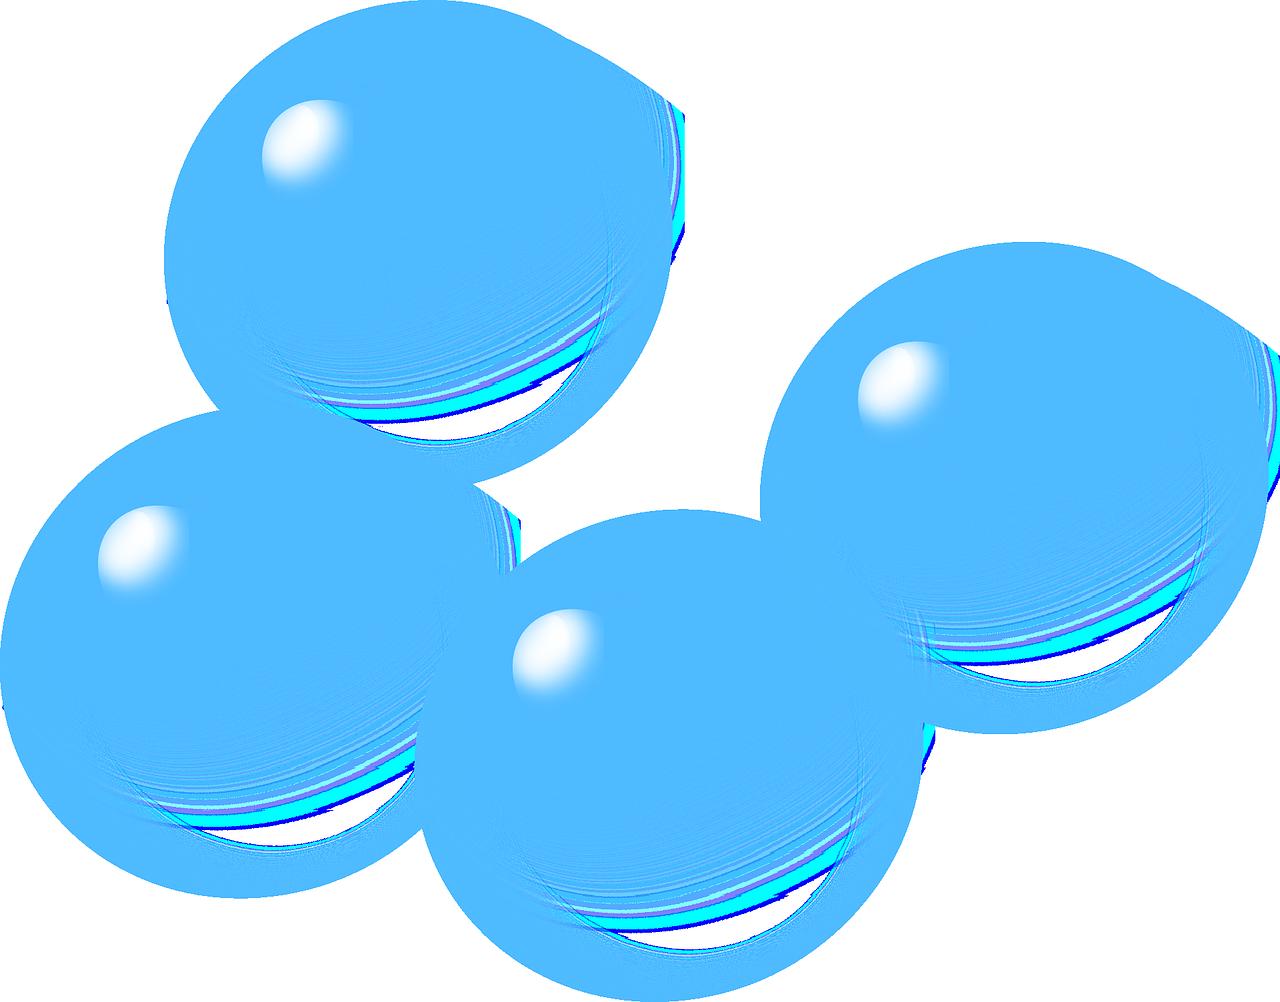 Ocean clipart bubbles.  collection of transparent